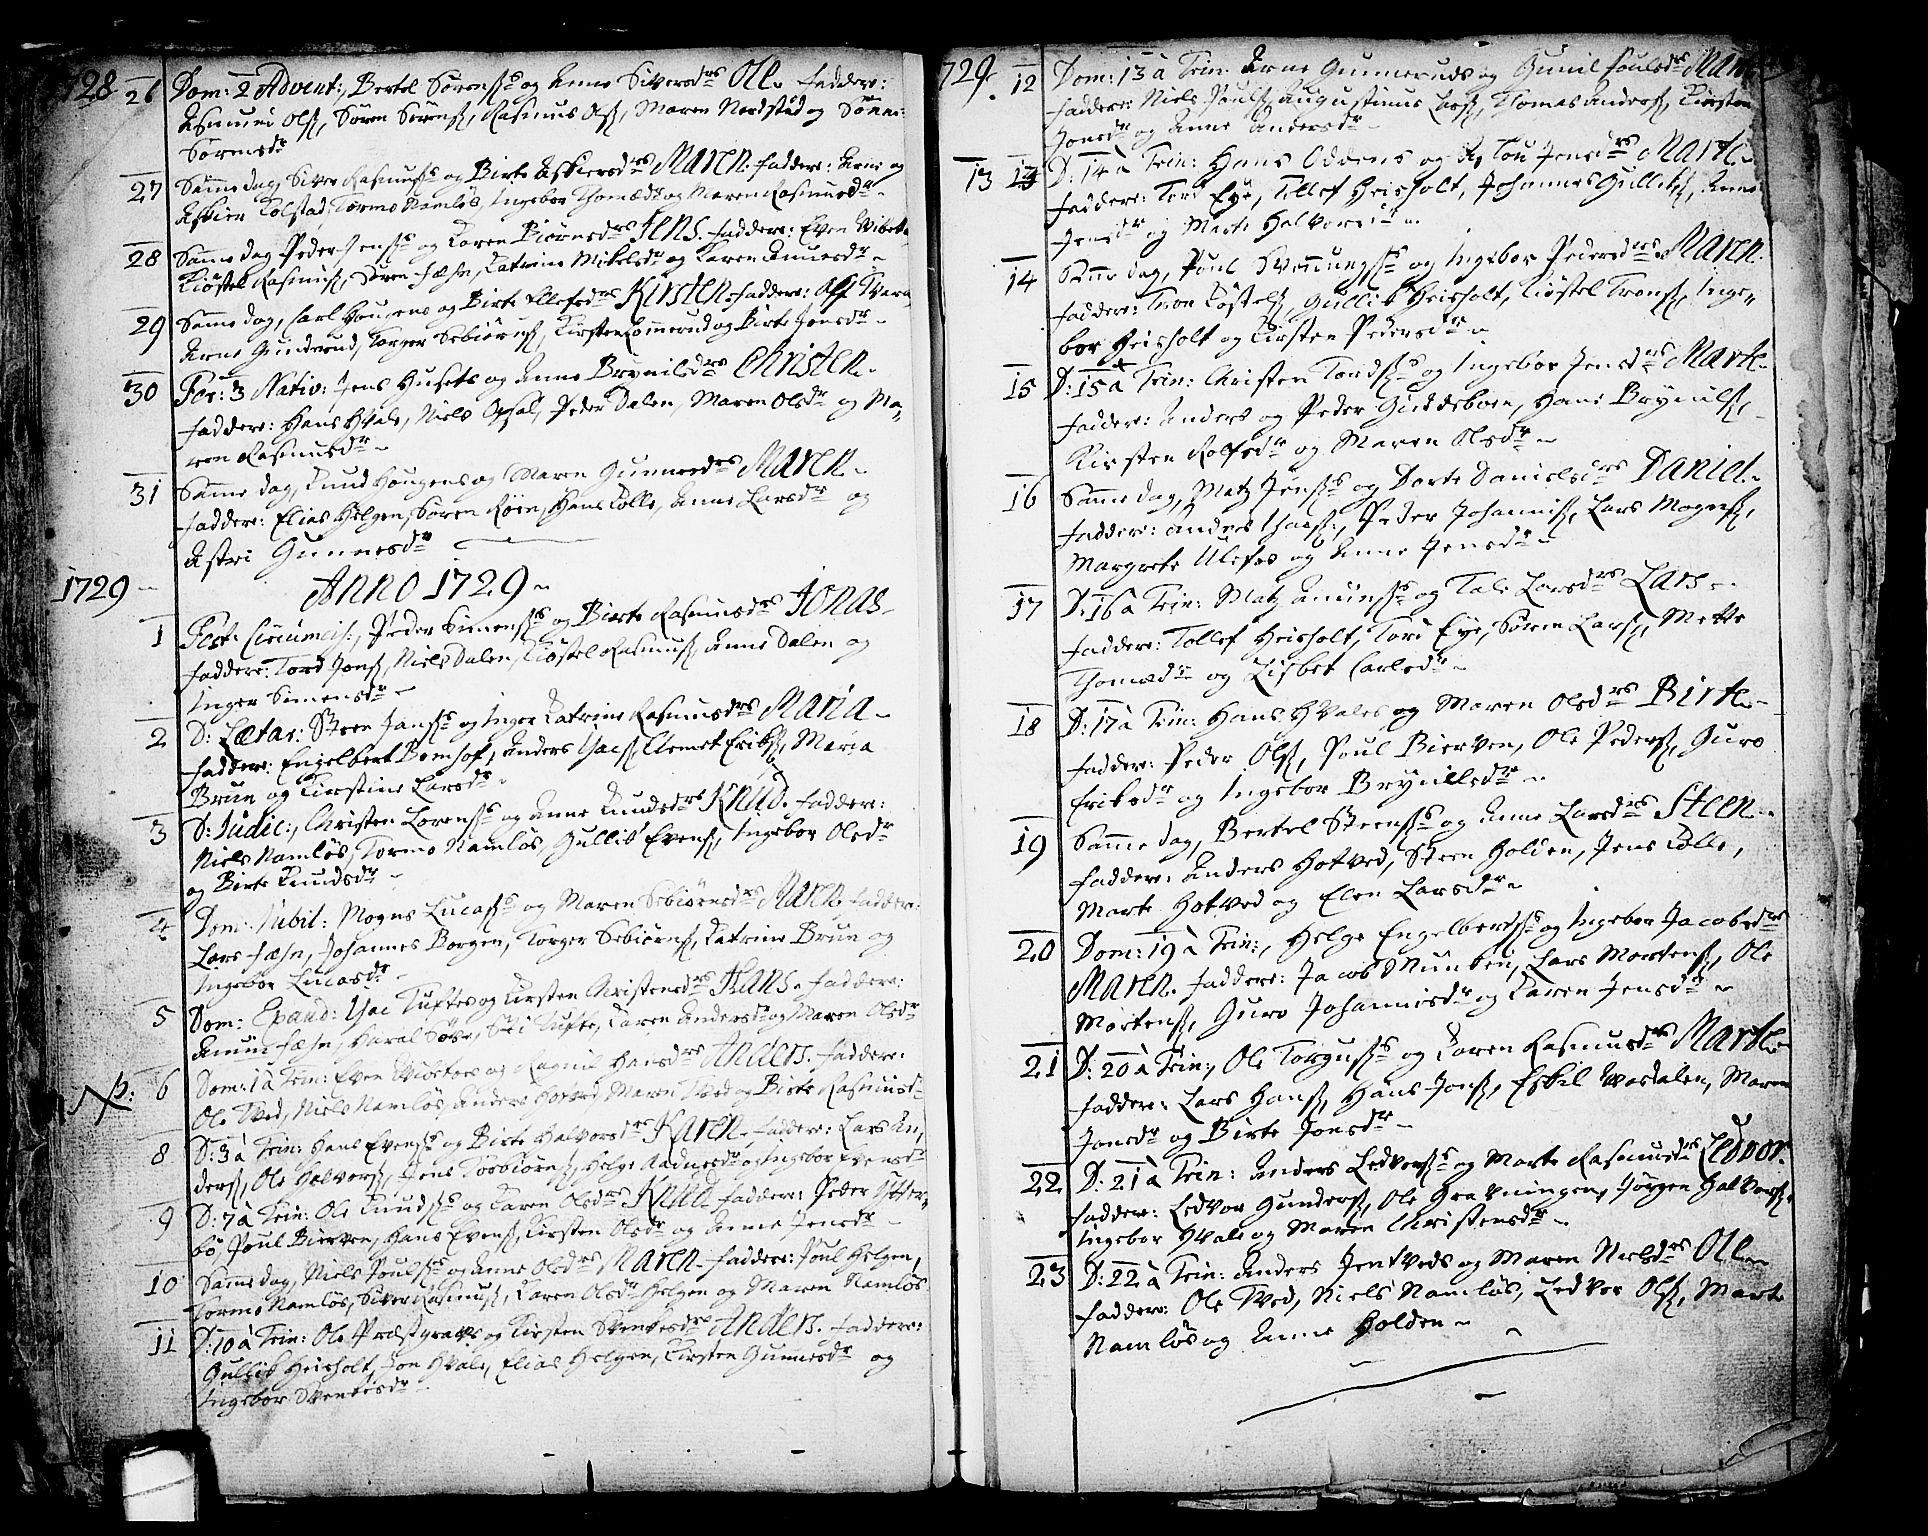 SAKO, Holla kirkebøker, F/Fa/L0001: Ministerialbok nr. 1, 1717-1779, s. 16